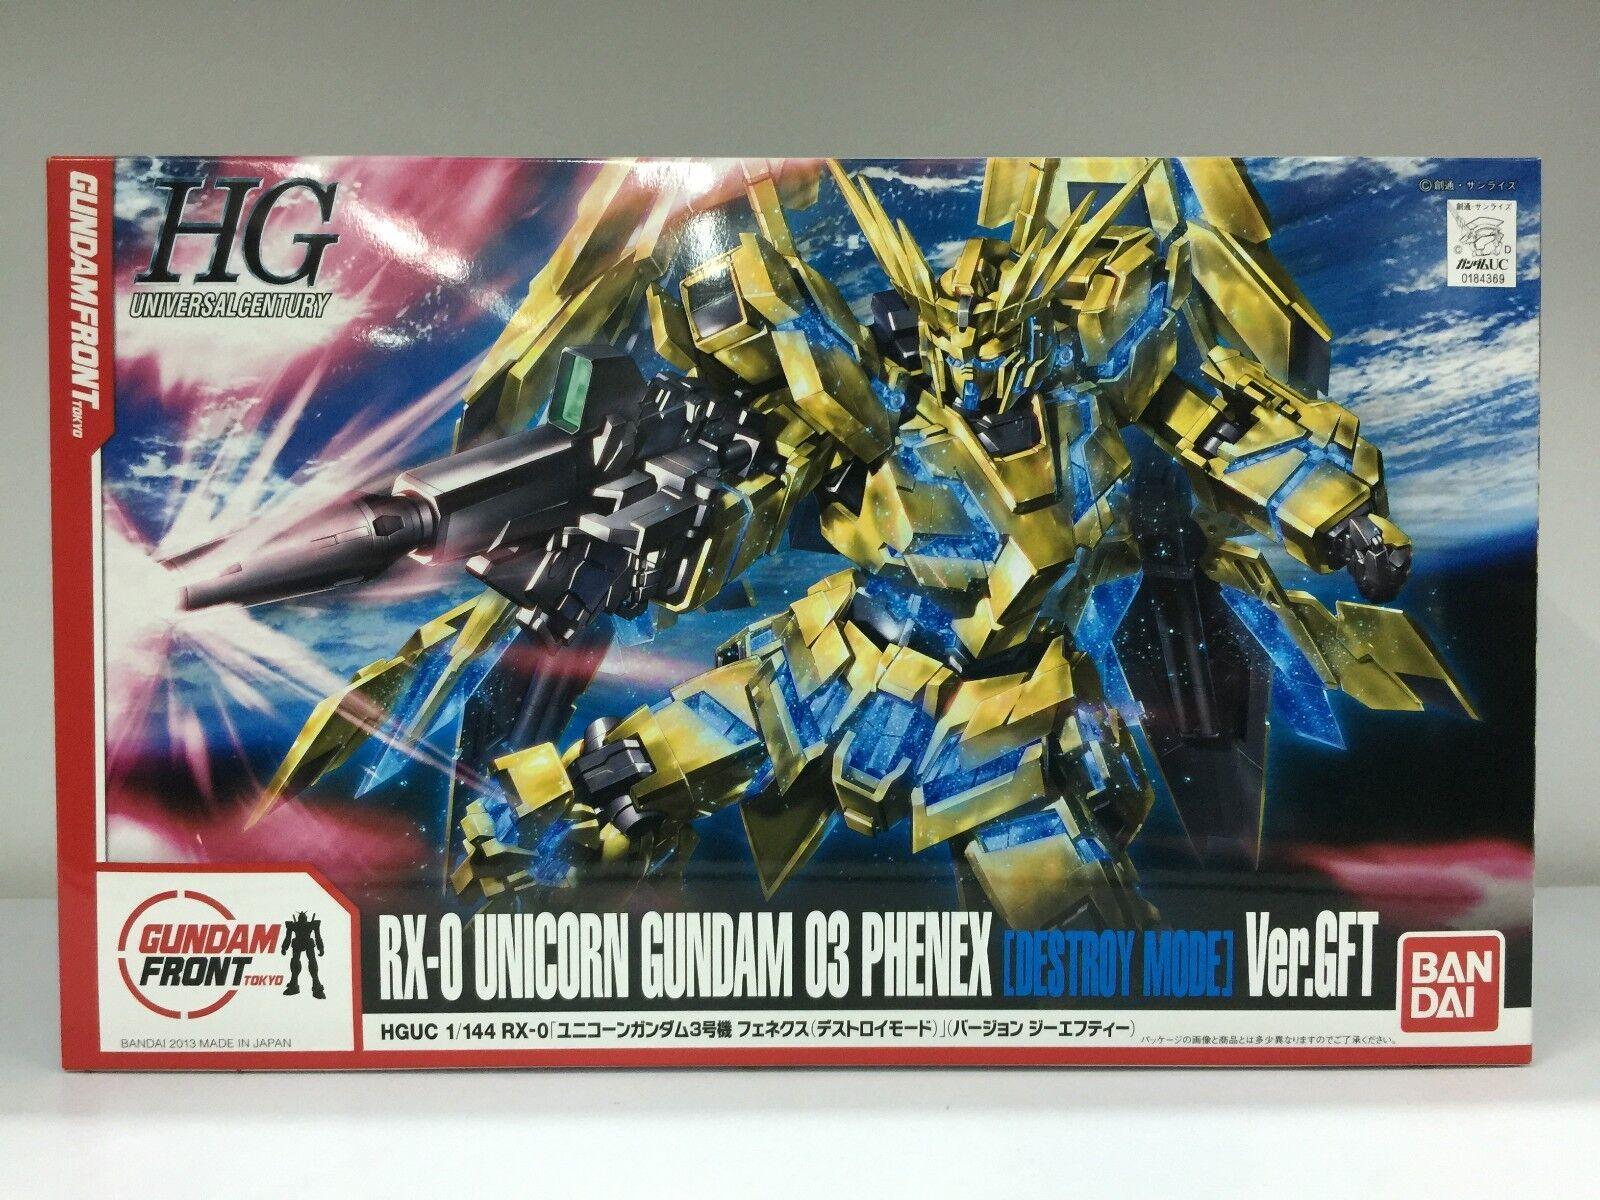 Bandai Gundam Front Tokyo HG 1  144 RX -0 Unicorn Gundam 03 Fenex Version GFT JPN